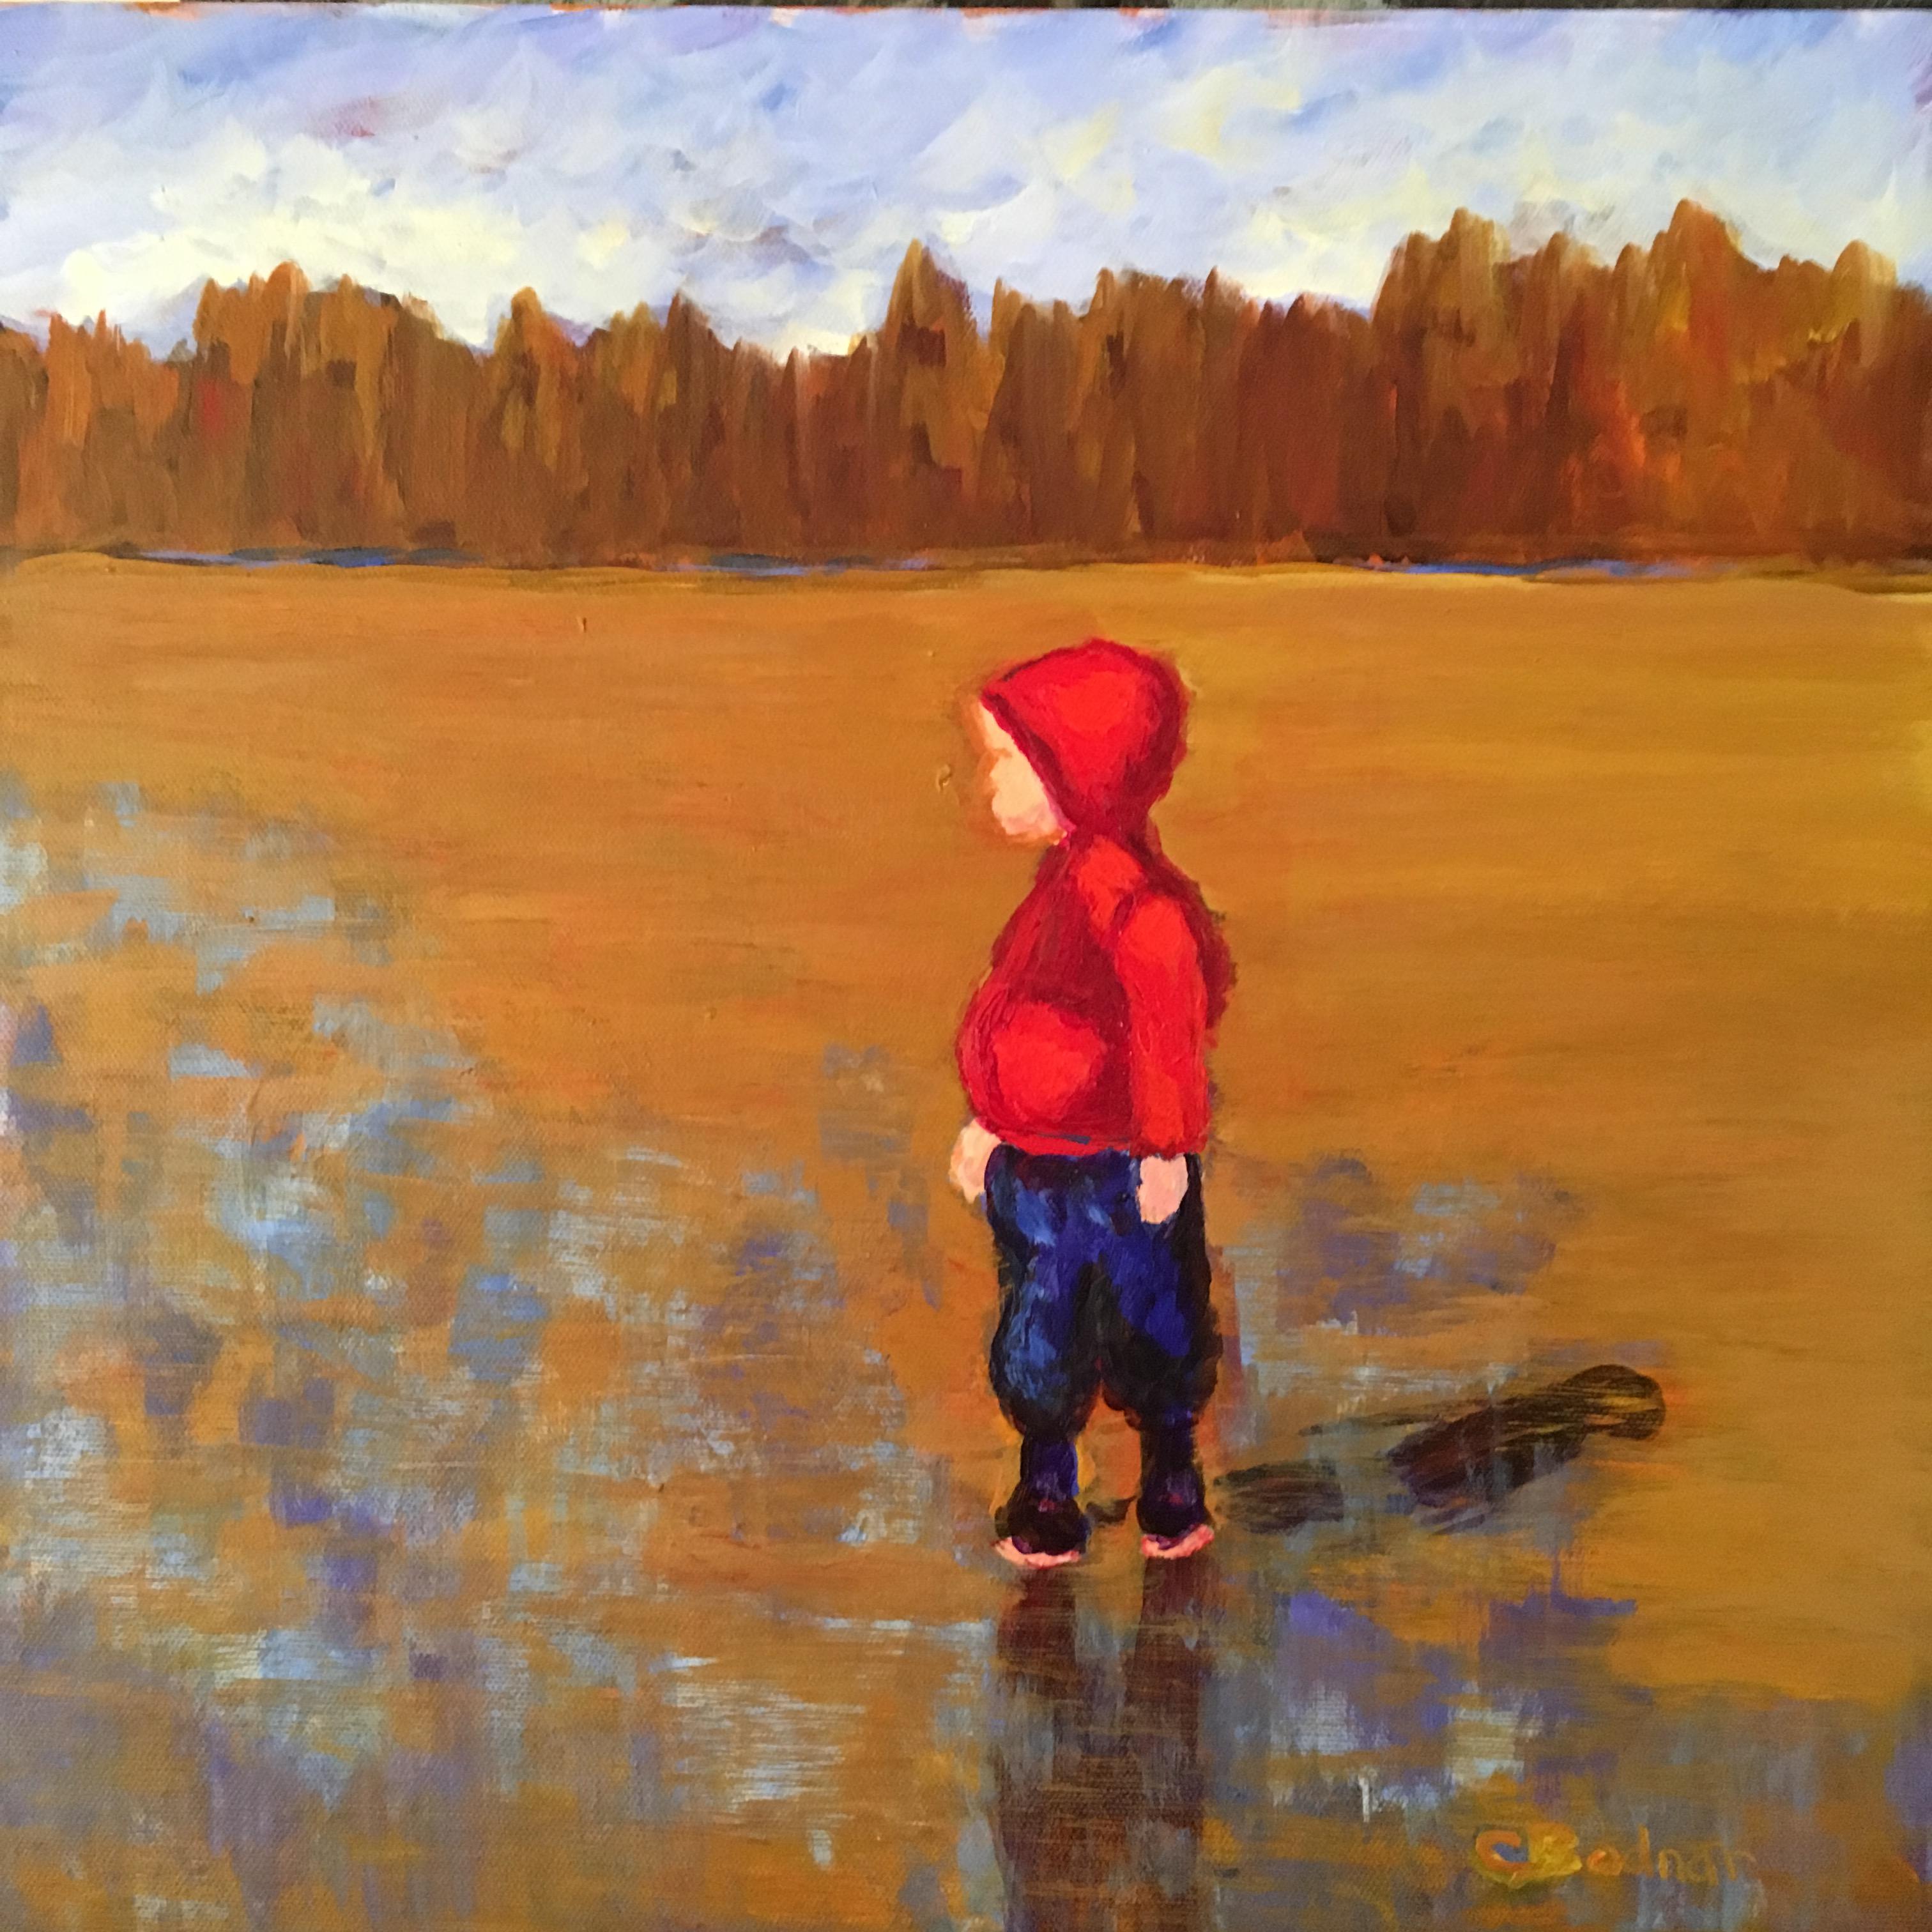 The Red Jacket by Cheryl Bodnar